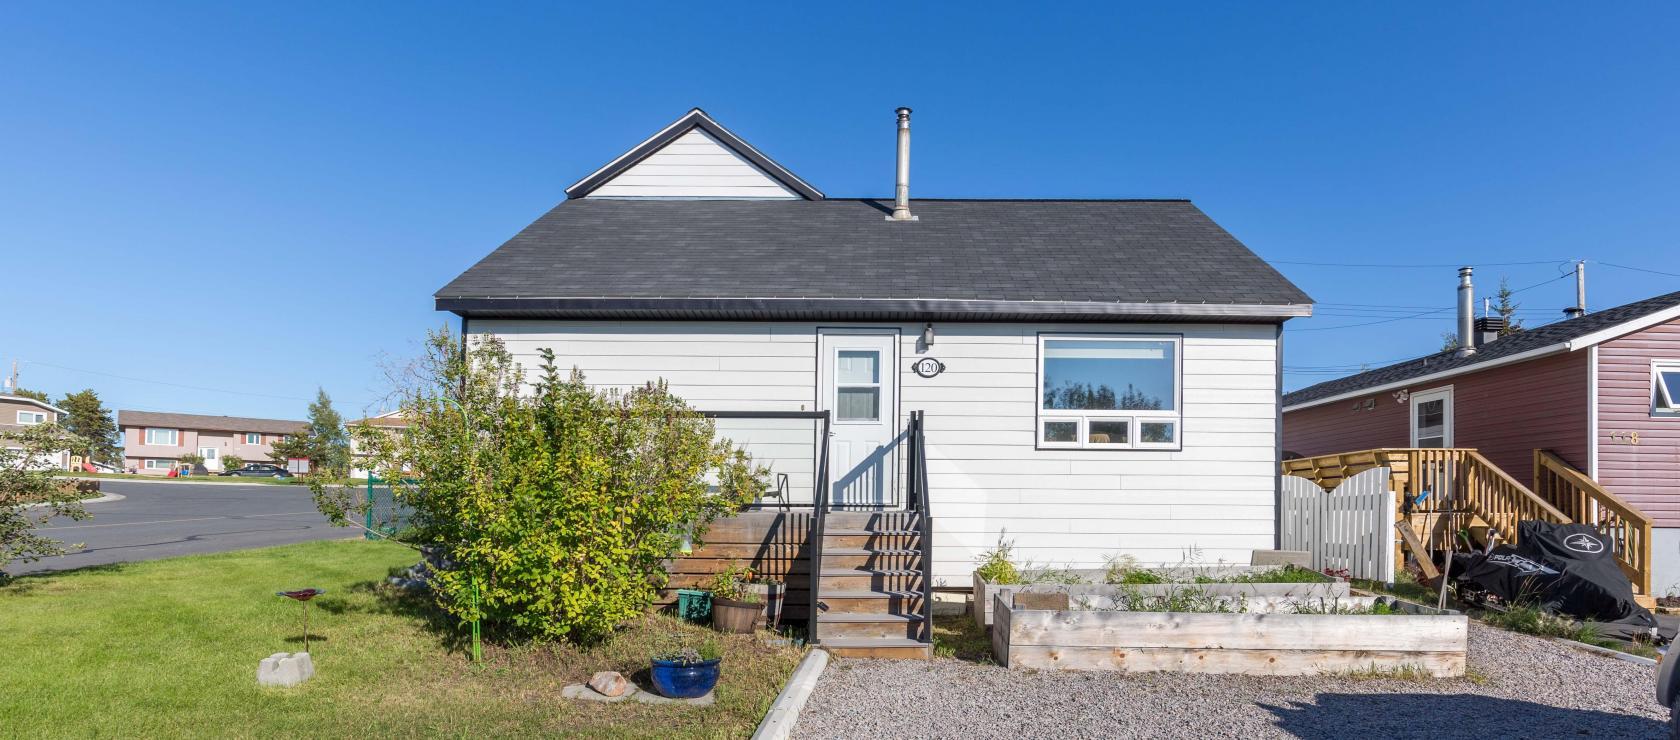 120 Knutsen Avenue, Frame Lake South, Yellowknife 2